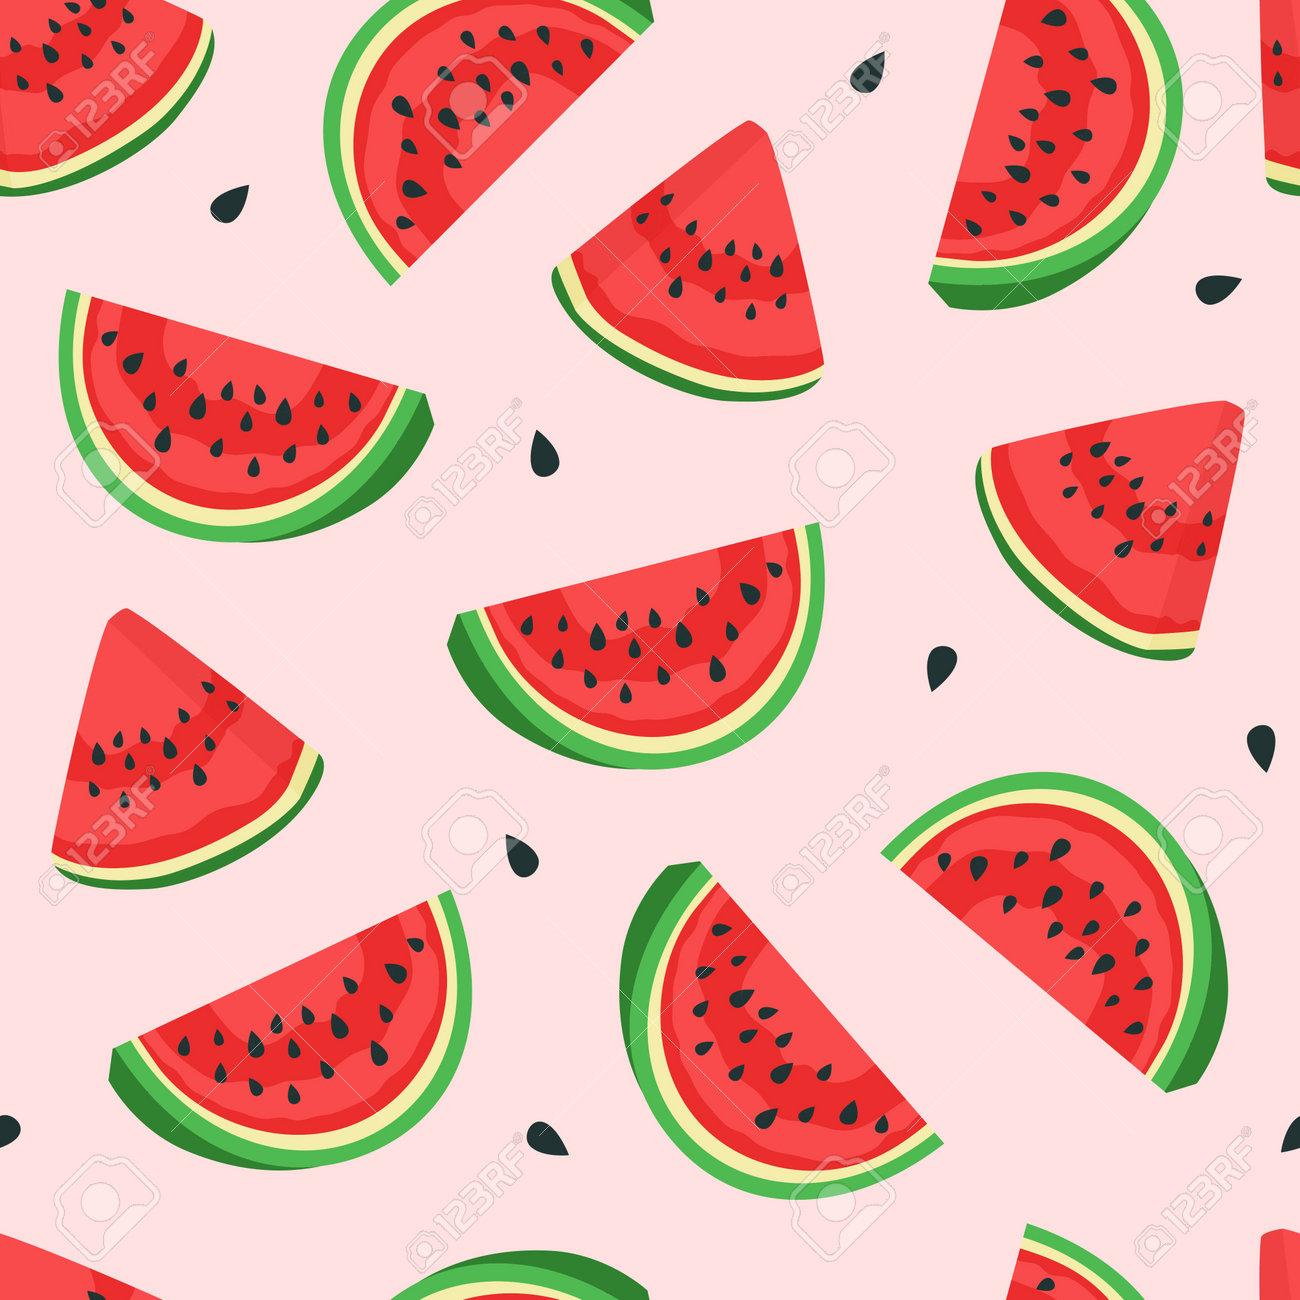 Watermelon pattern. Vector - 172329641